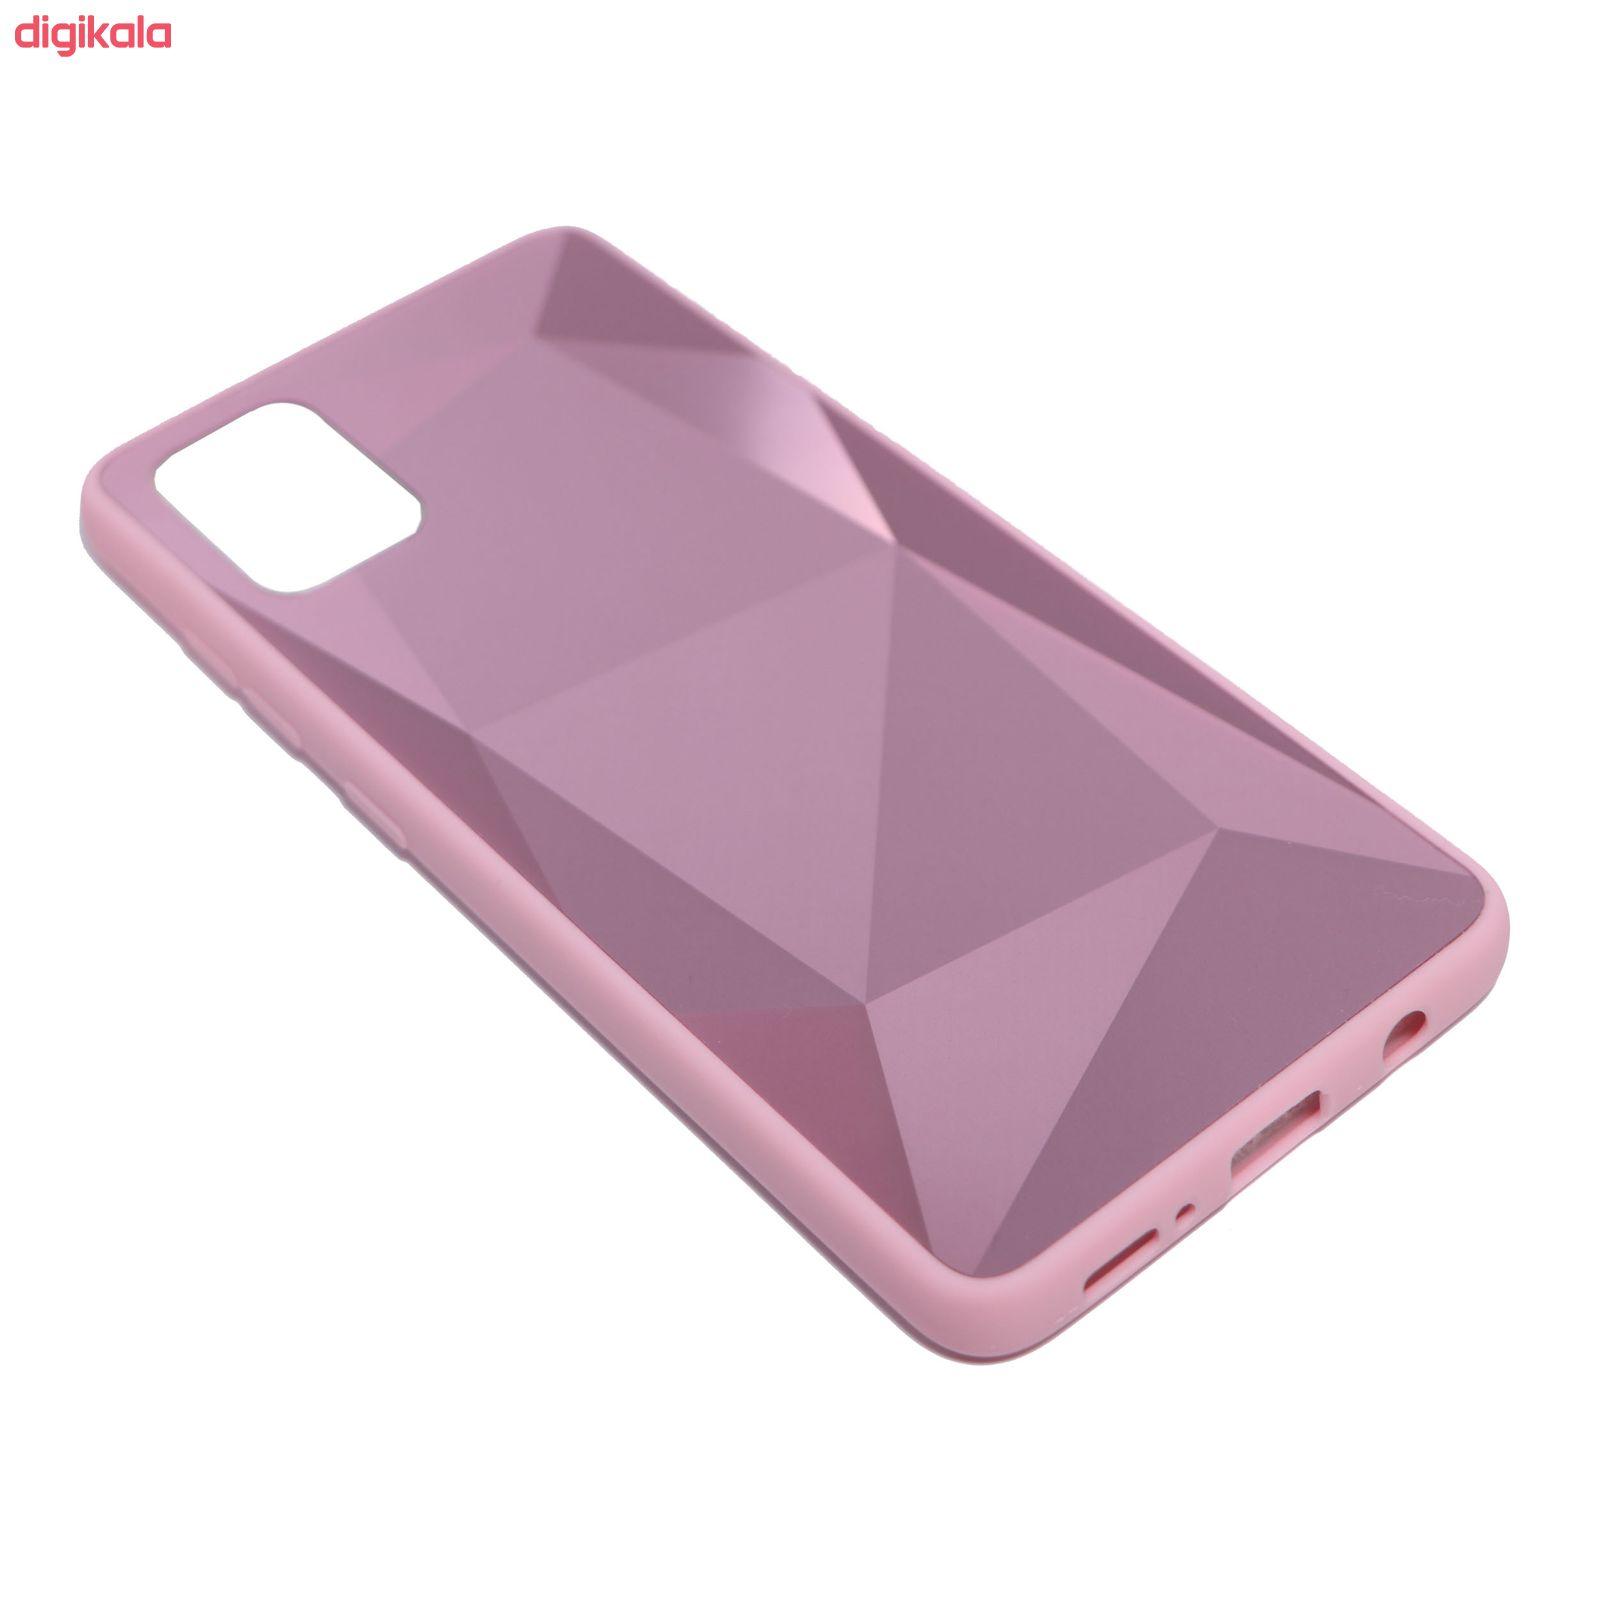 کاور مدل a-1 طرح الماس مناسب برای گوشی موبایل سامسونگ Galaxy A51  main 1 3